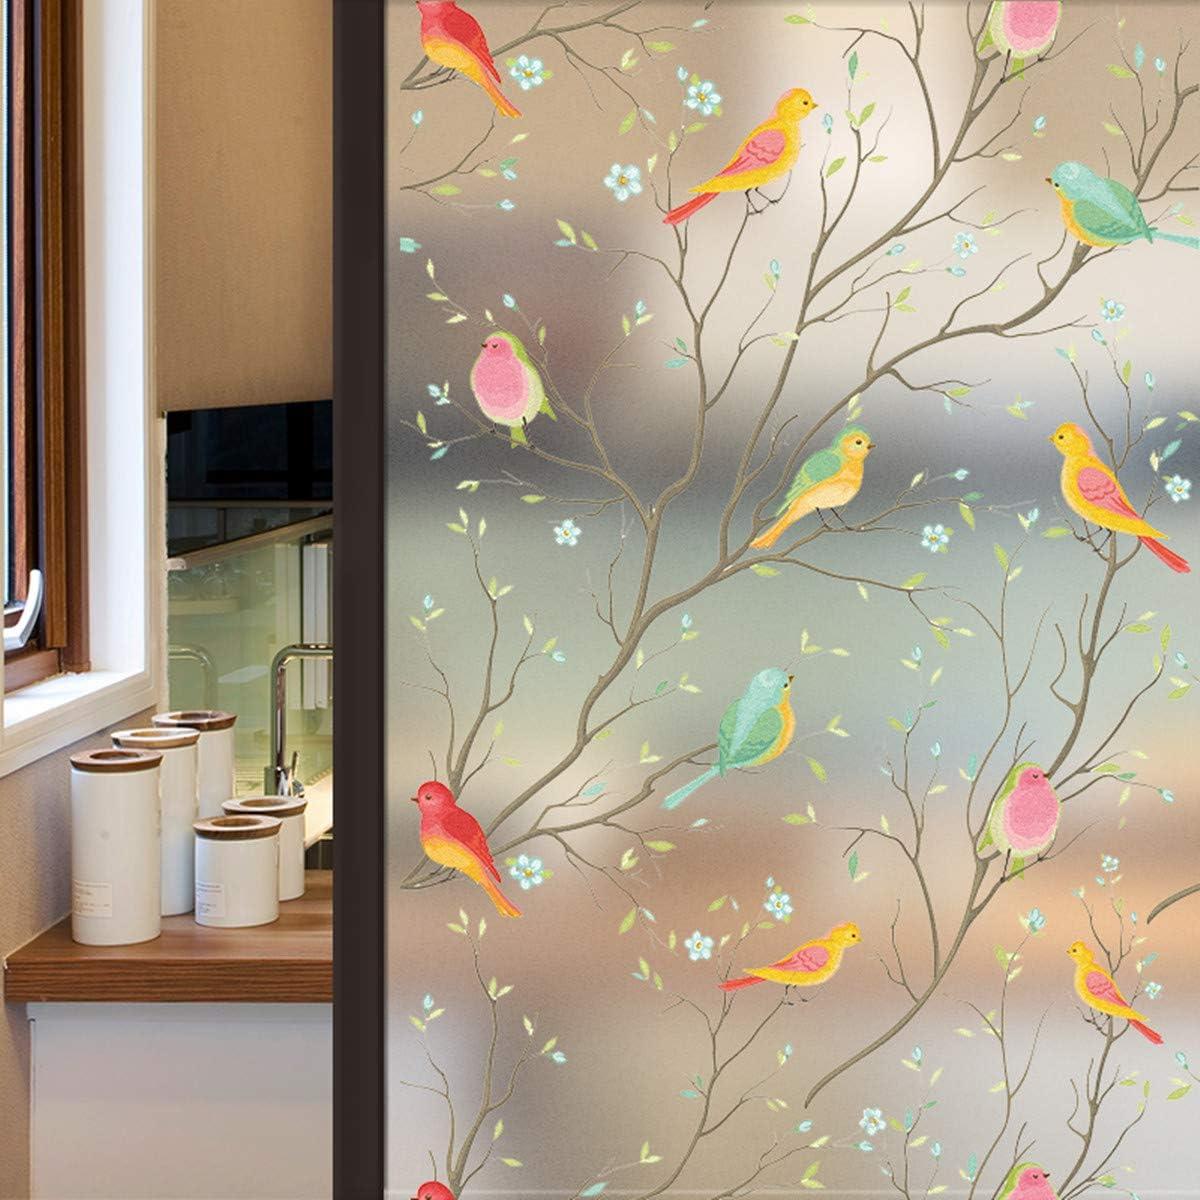 Lifetree Lámina de Vidrio para Ventanas, intimidad, Vidrio Esmerilado, estática, pájaro 44.5 * 200cm